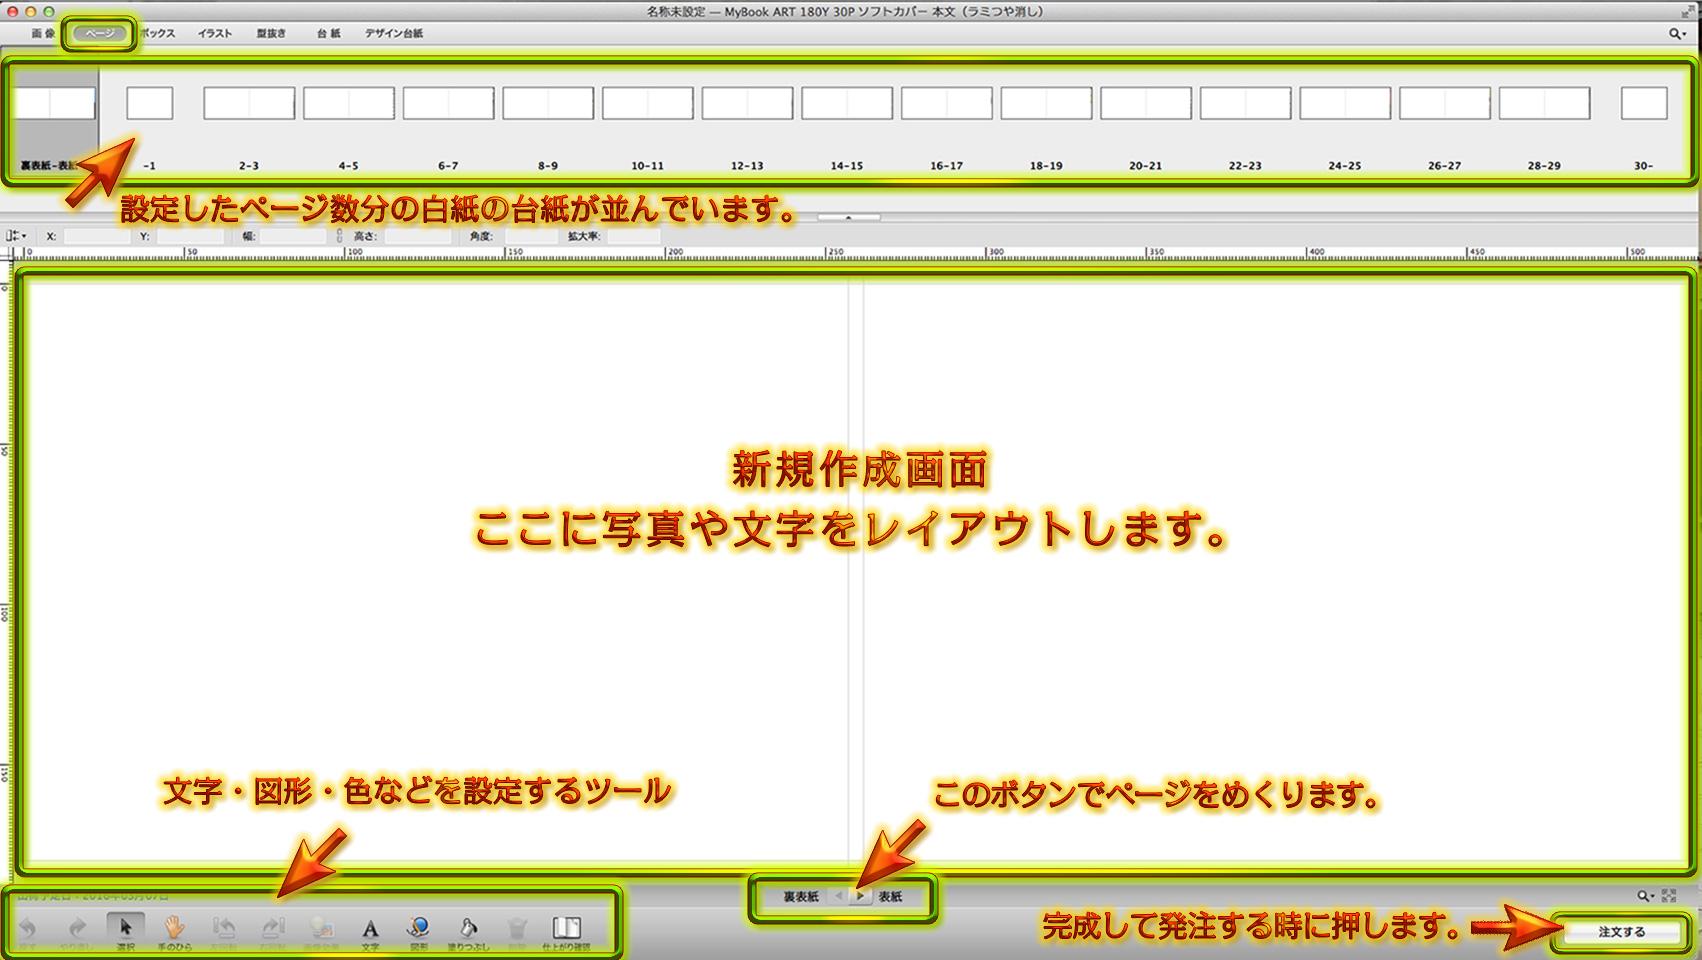 http://moritetsu.info/car/img/mb035-2016-02-28-15-34-23.jpg